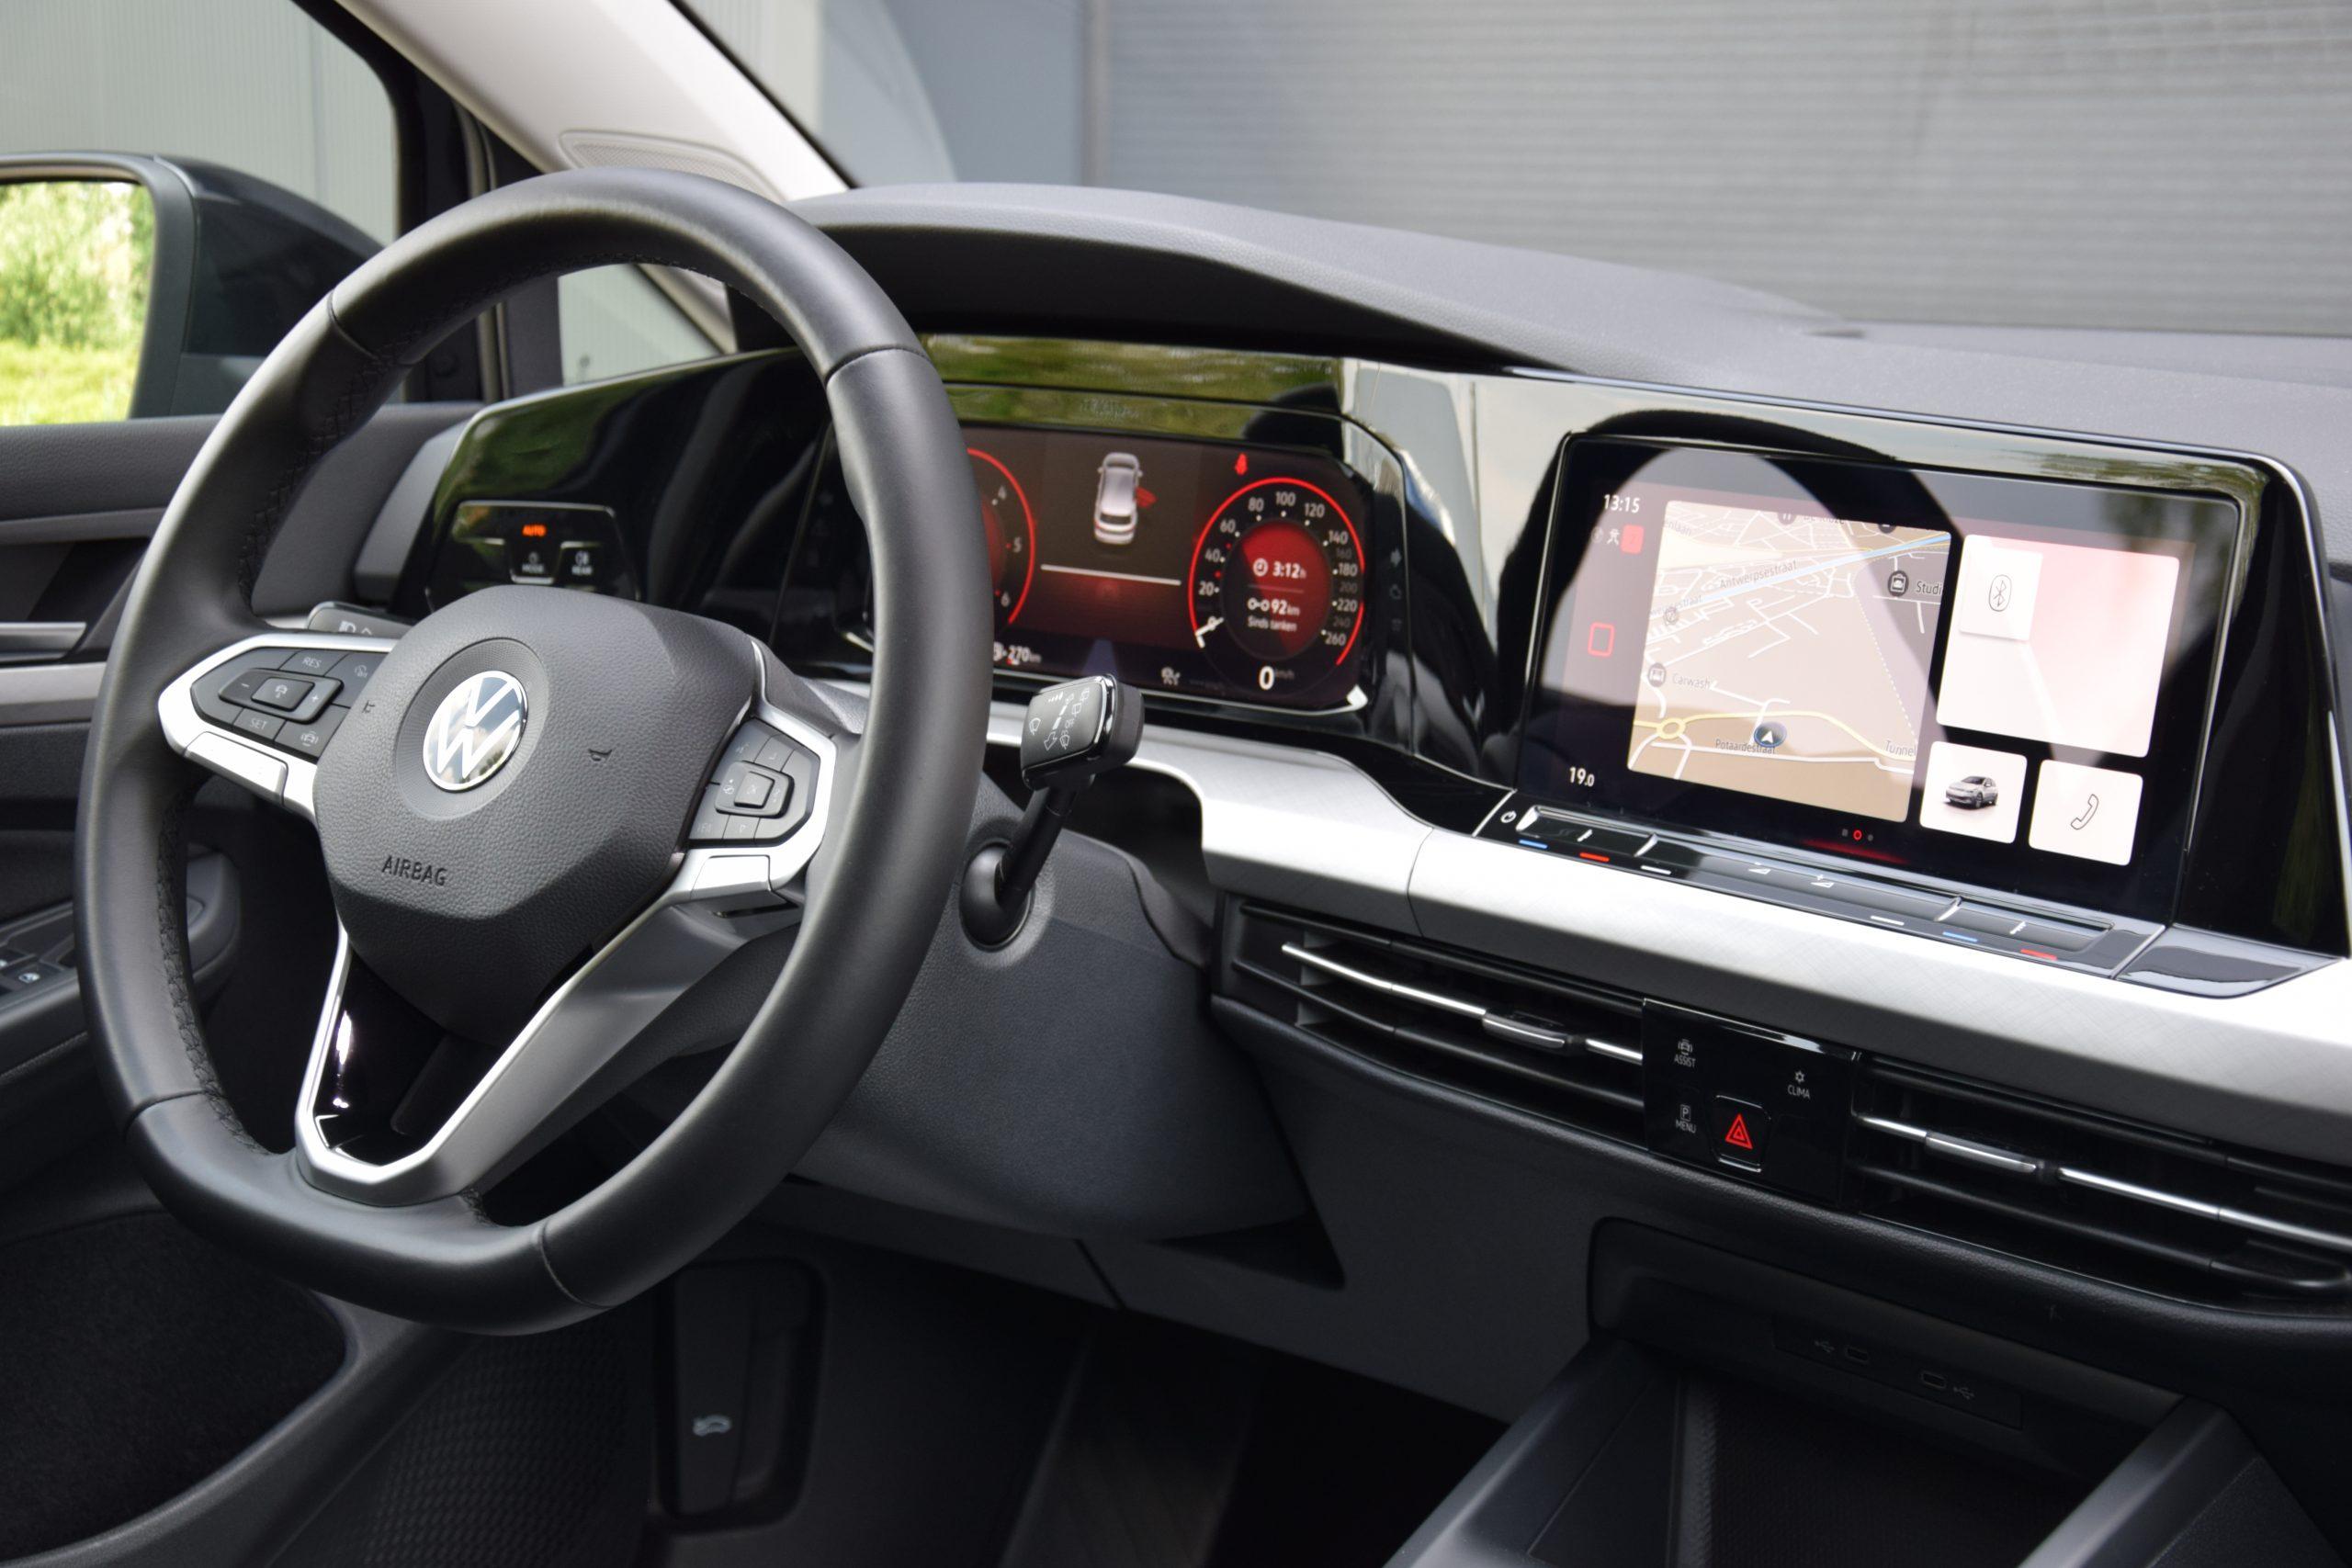 Volkswagen Golf 2.0 SCR TDi DSG 04/2021 – 7.000 km!!